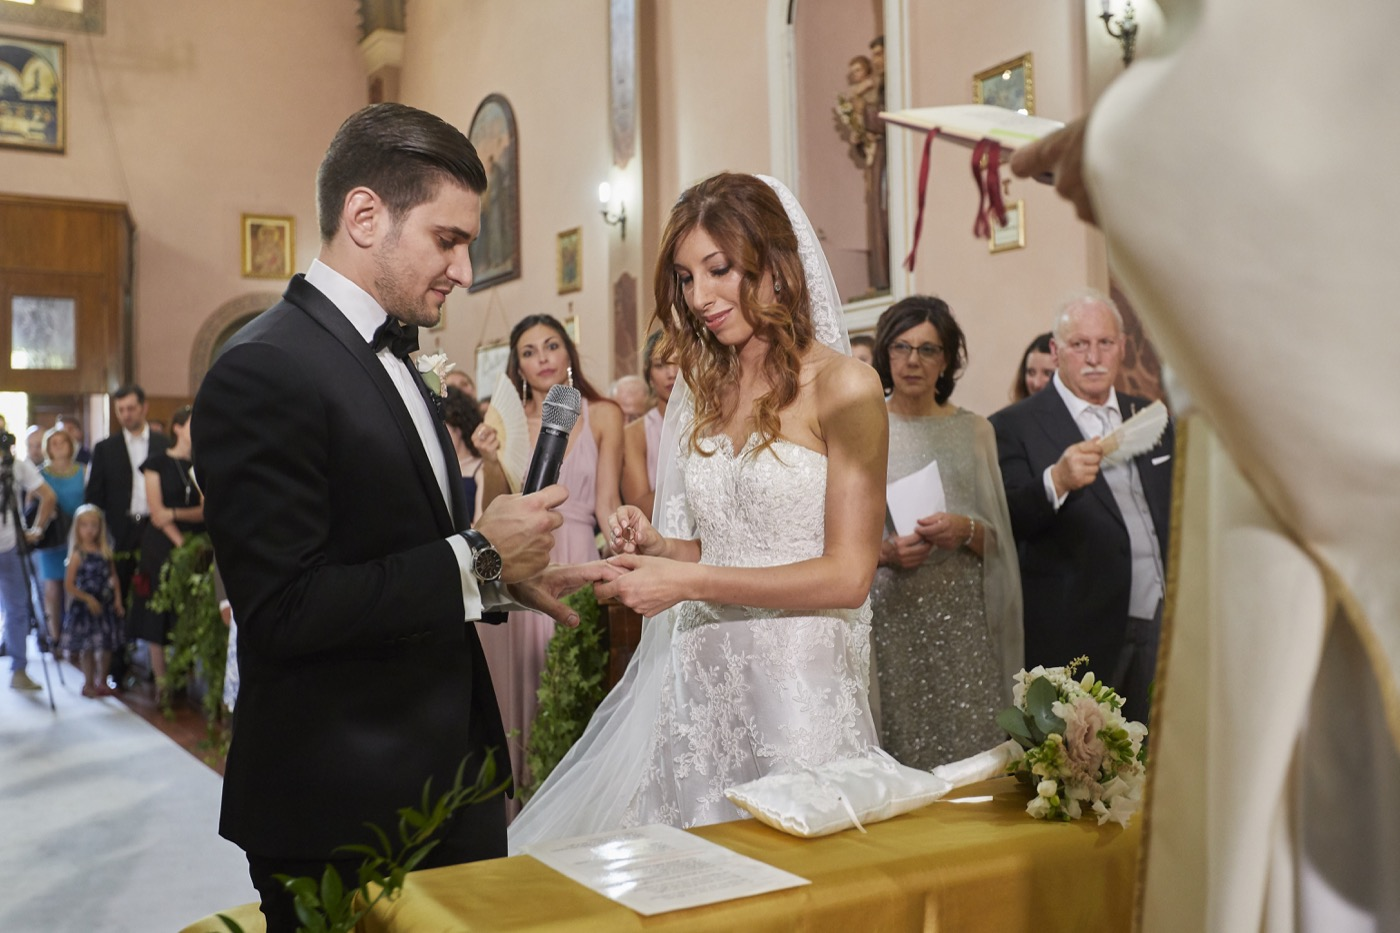 Claudio-Coppola-wedding-photographer-abbazia-7-frati-piegaro-49